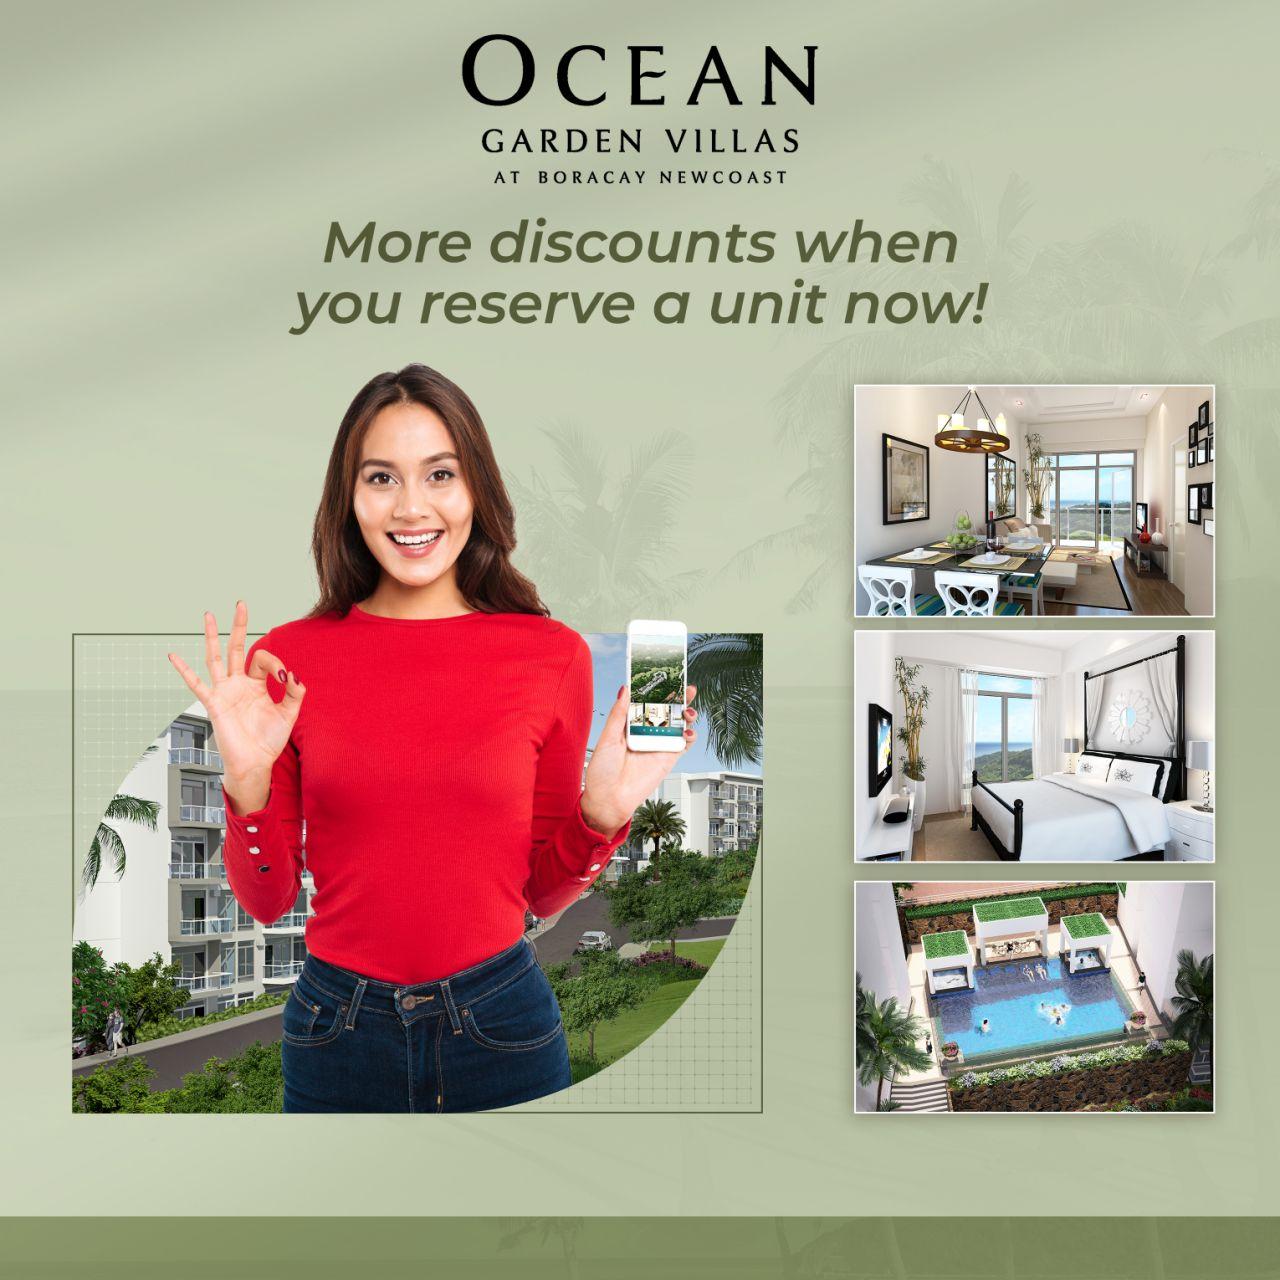 Ocean Garden Villas Discounts